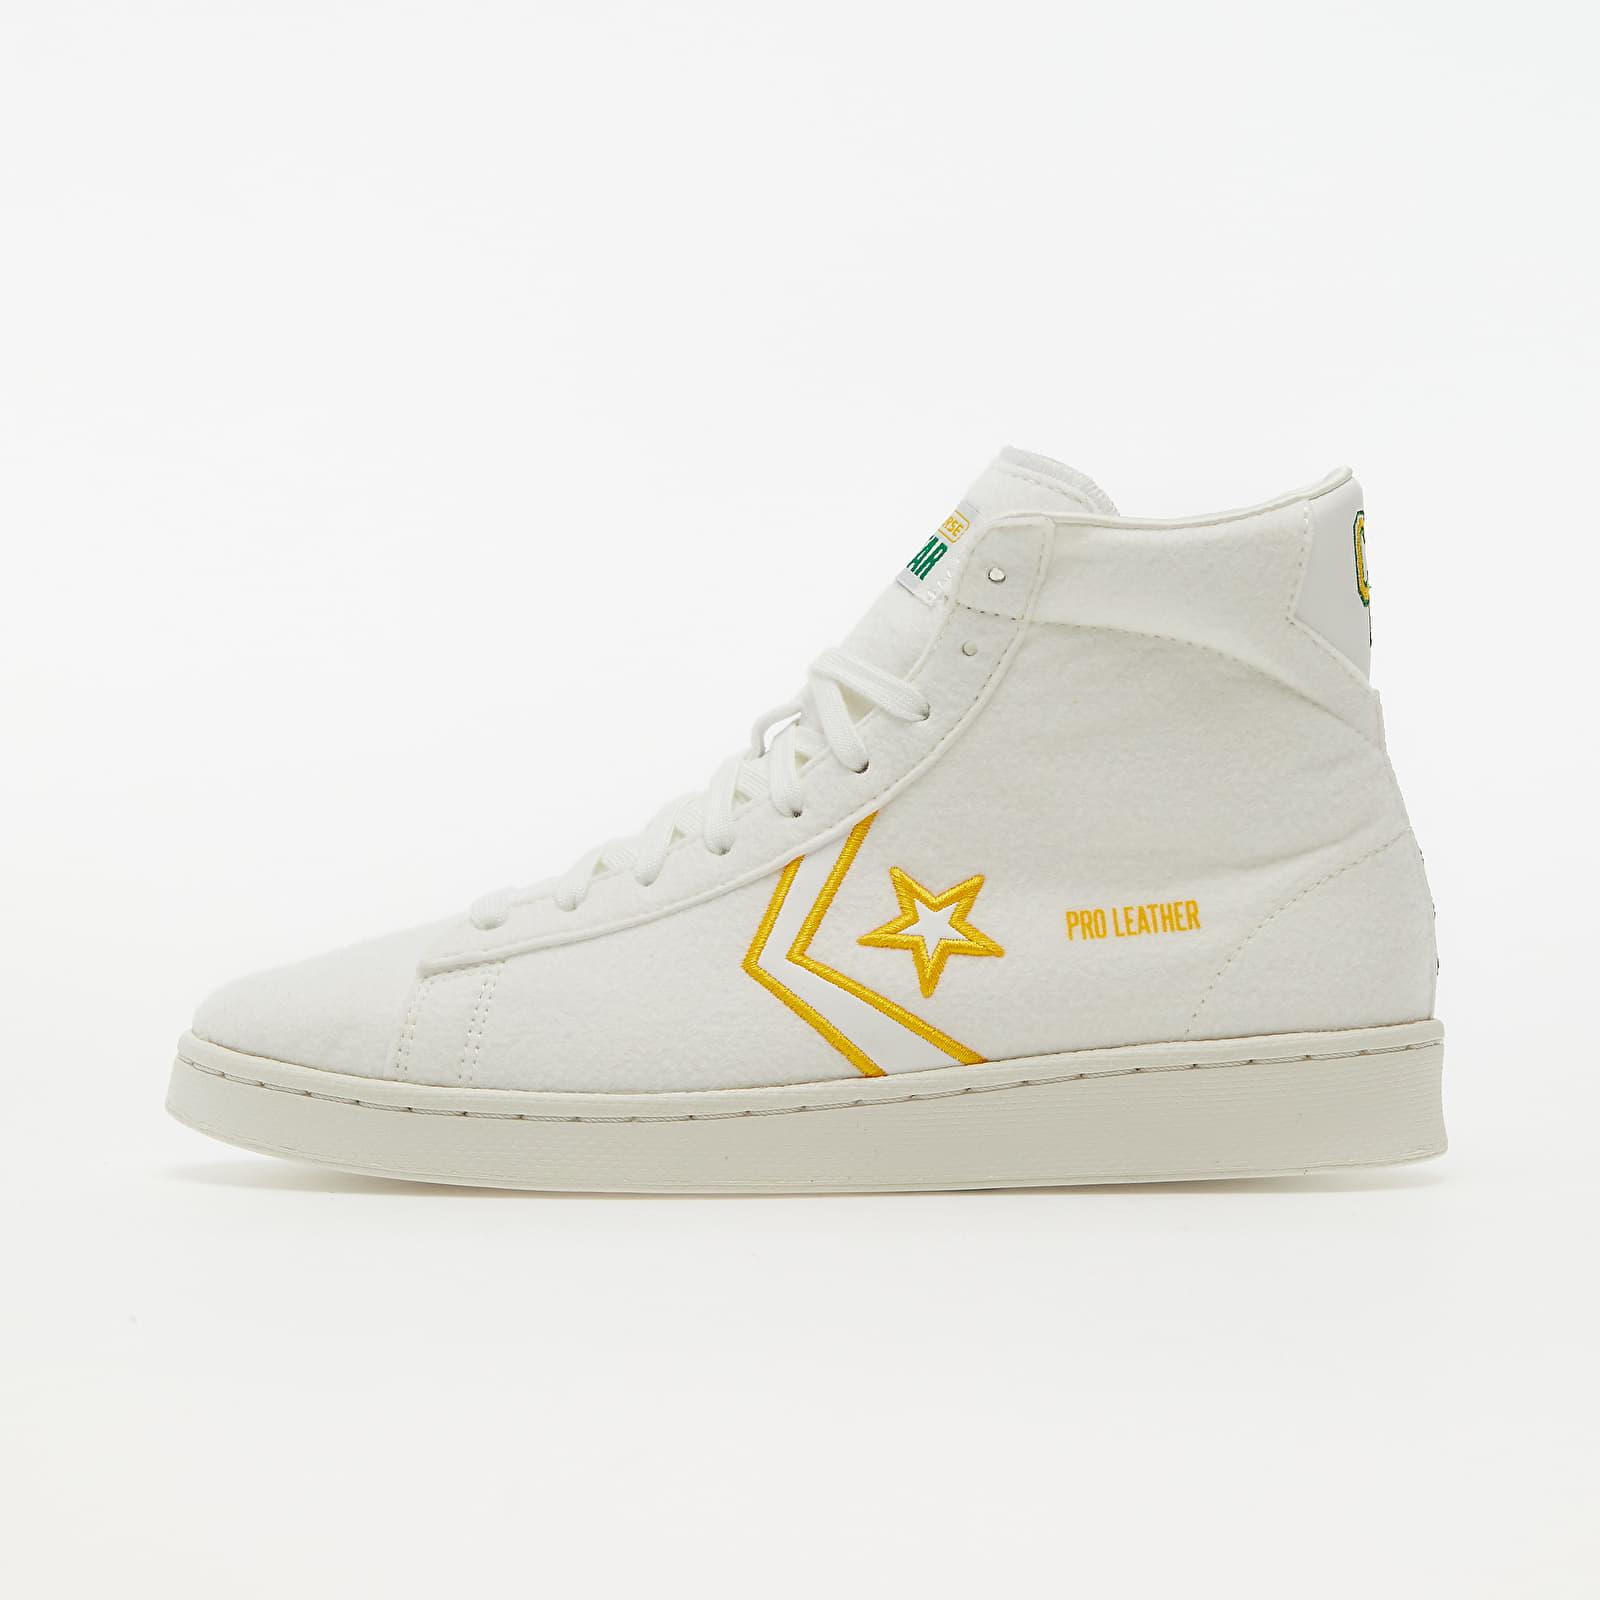 Converse Pro Leather Vintage White/ Green/ Amarillo 170493C